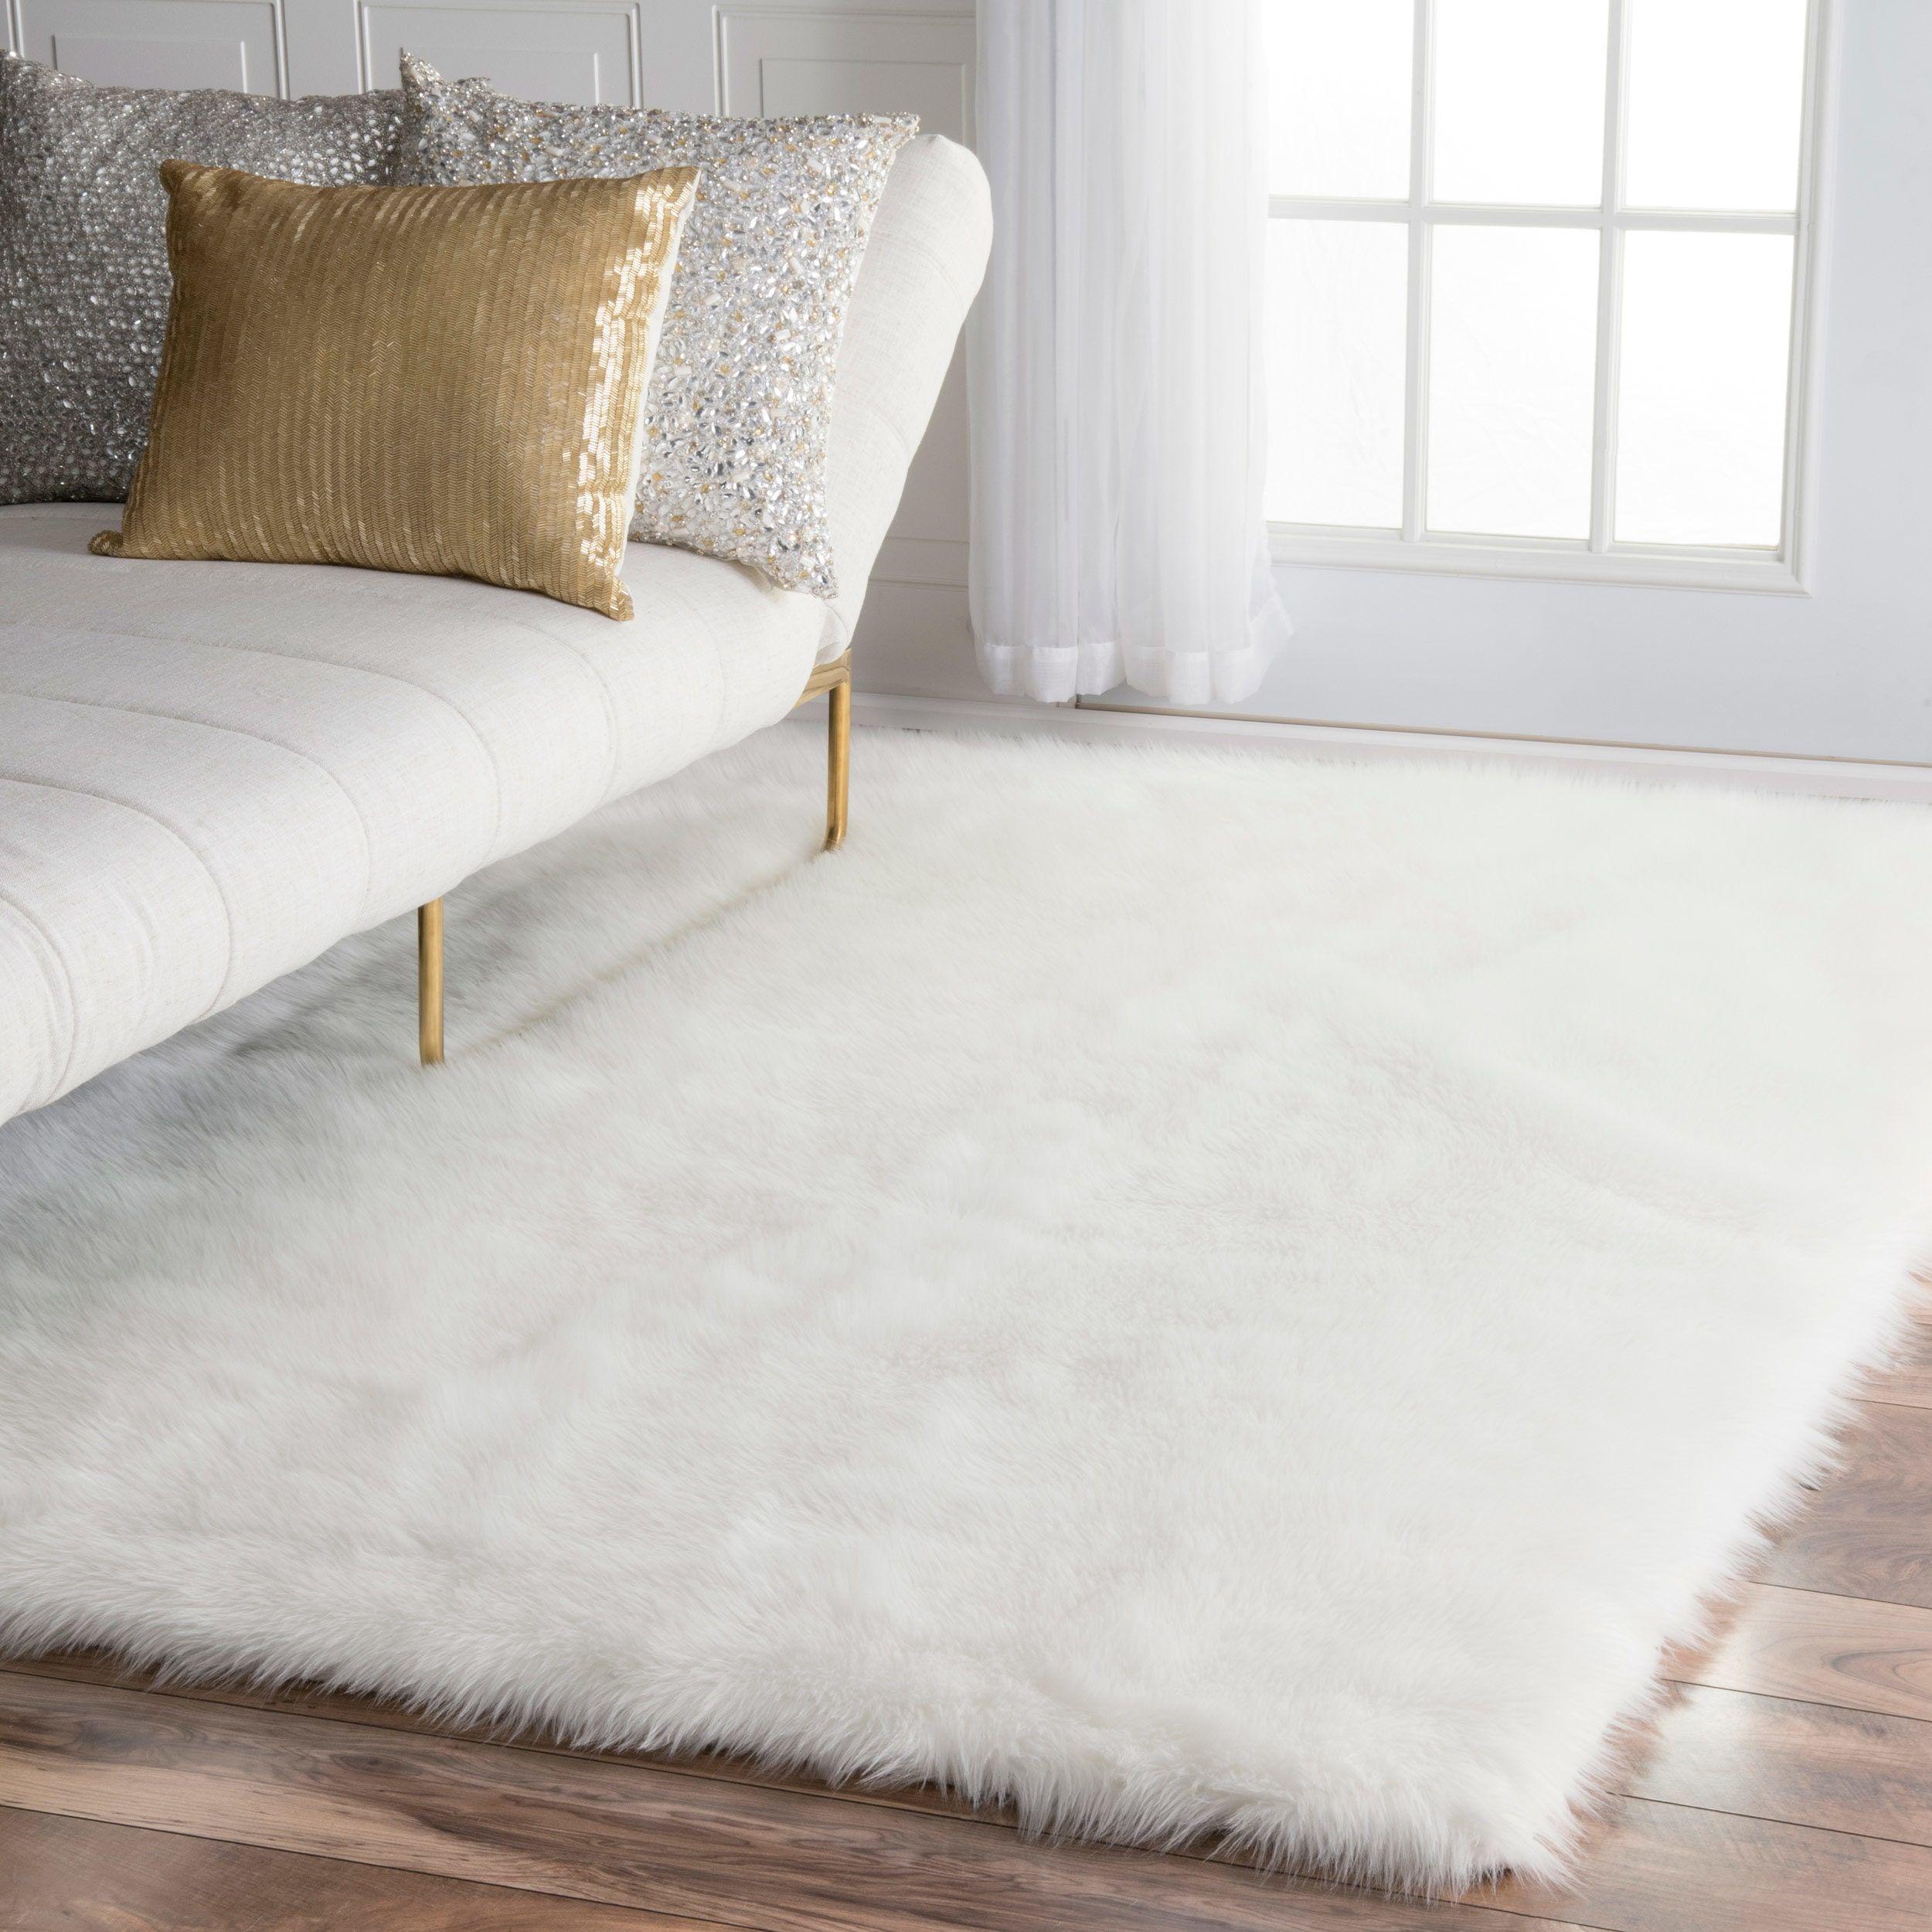 Nuloom Faux Flokati Sheepskin Solid Soft And Plush Cloud White Rug 6 X9 Size X 9